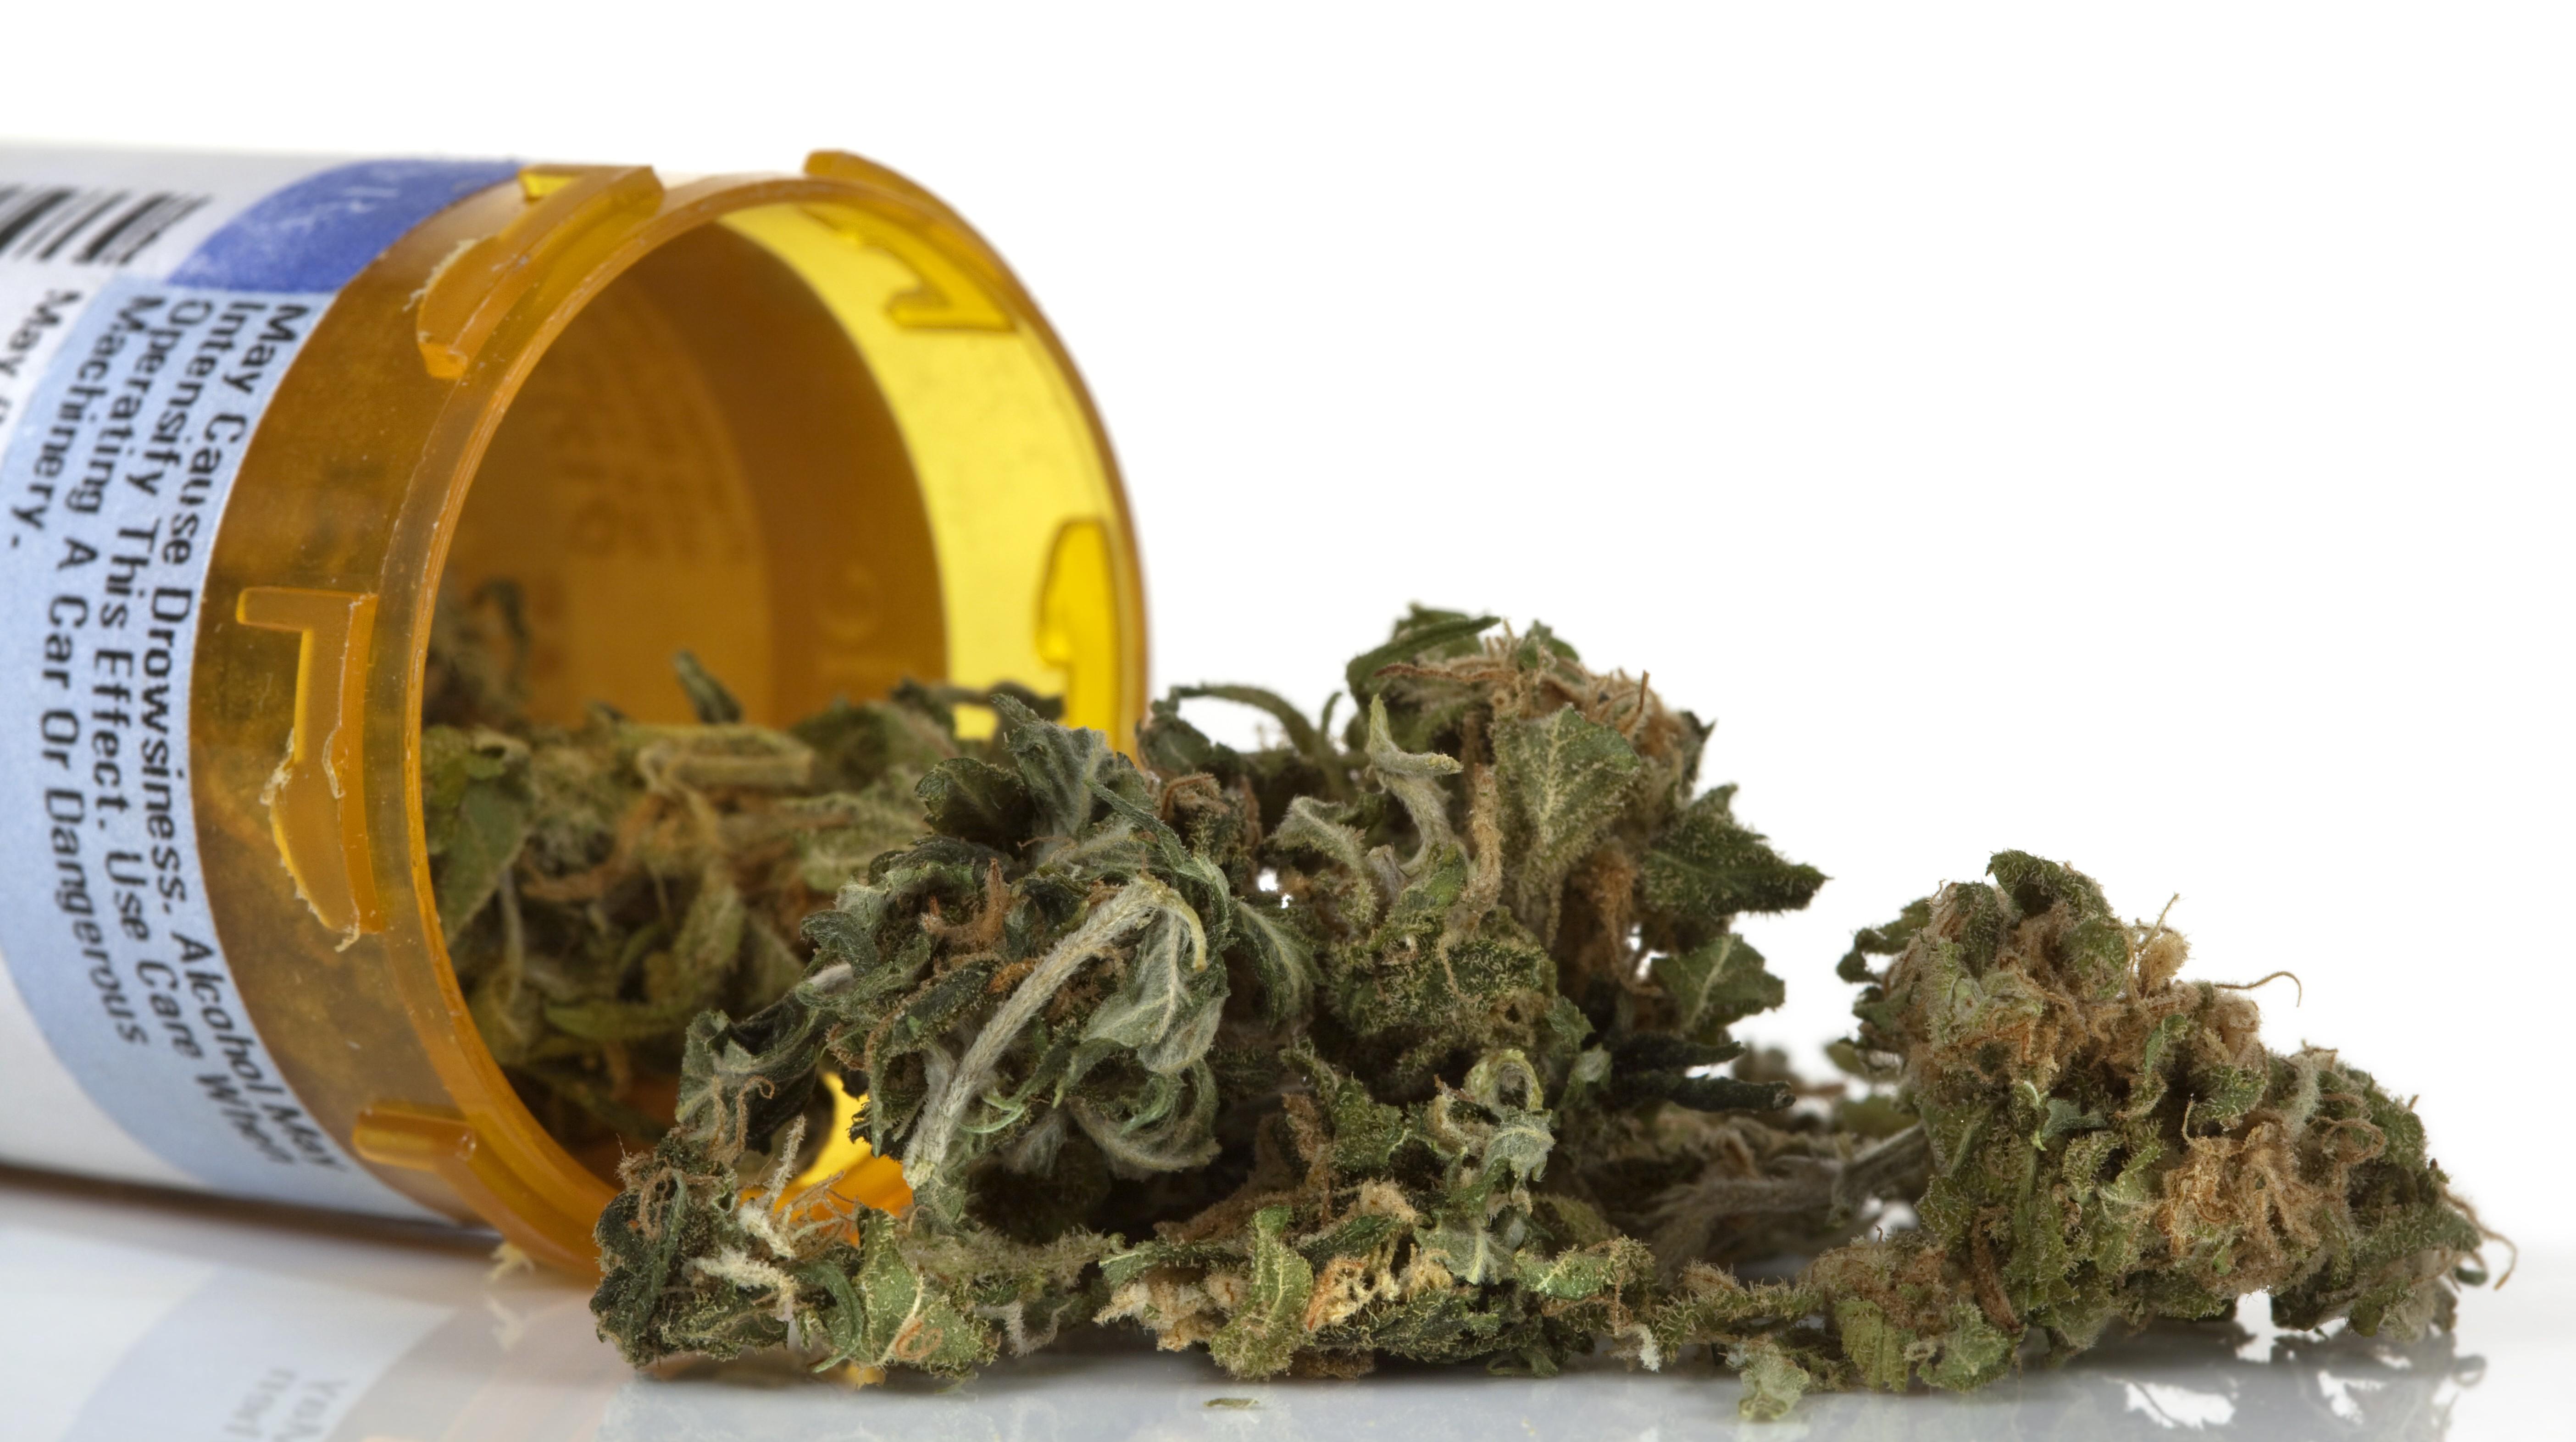 Feds set rules for growing medical marijuana